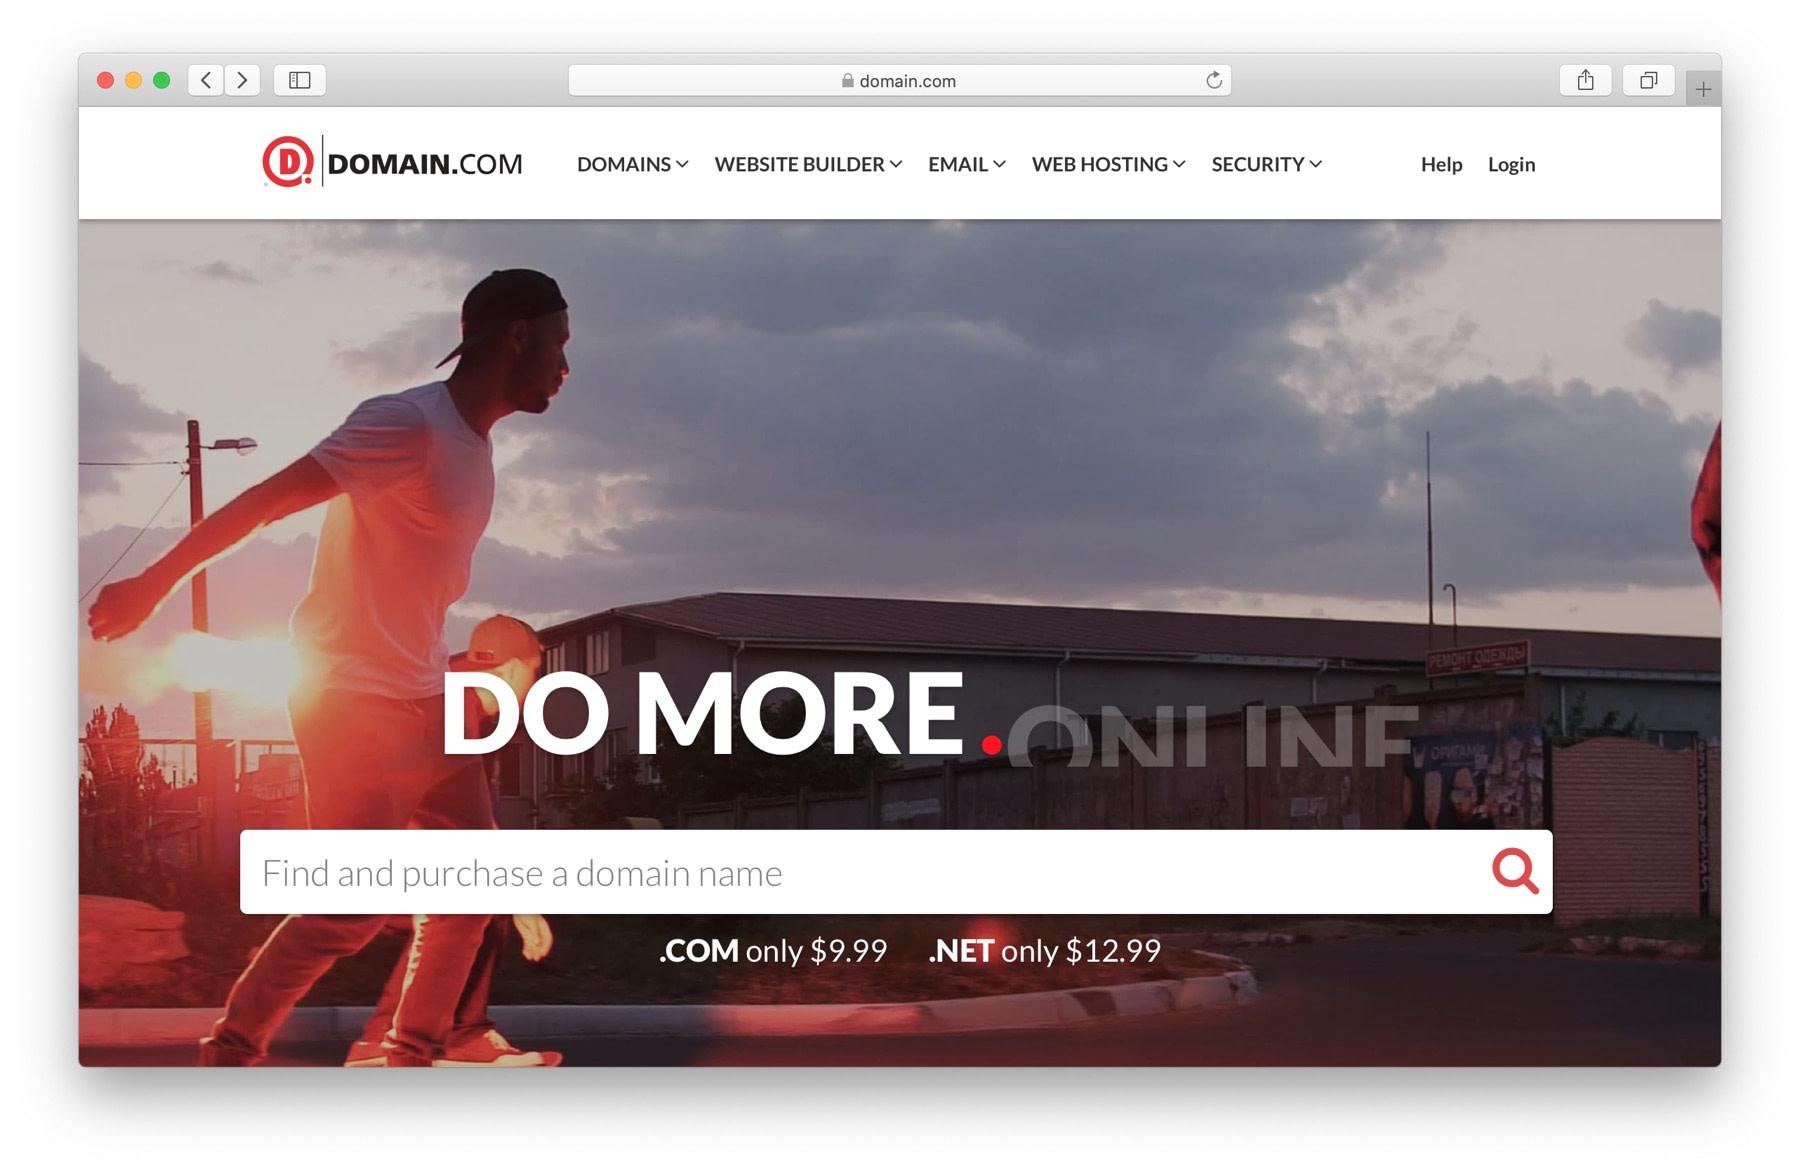 Best domain name registrar #1: Domain.com